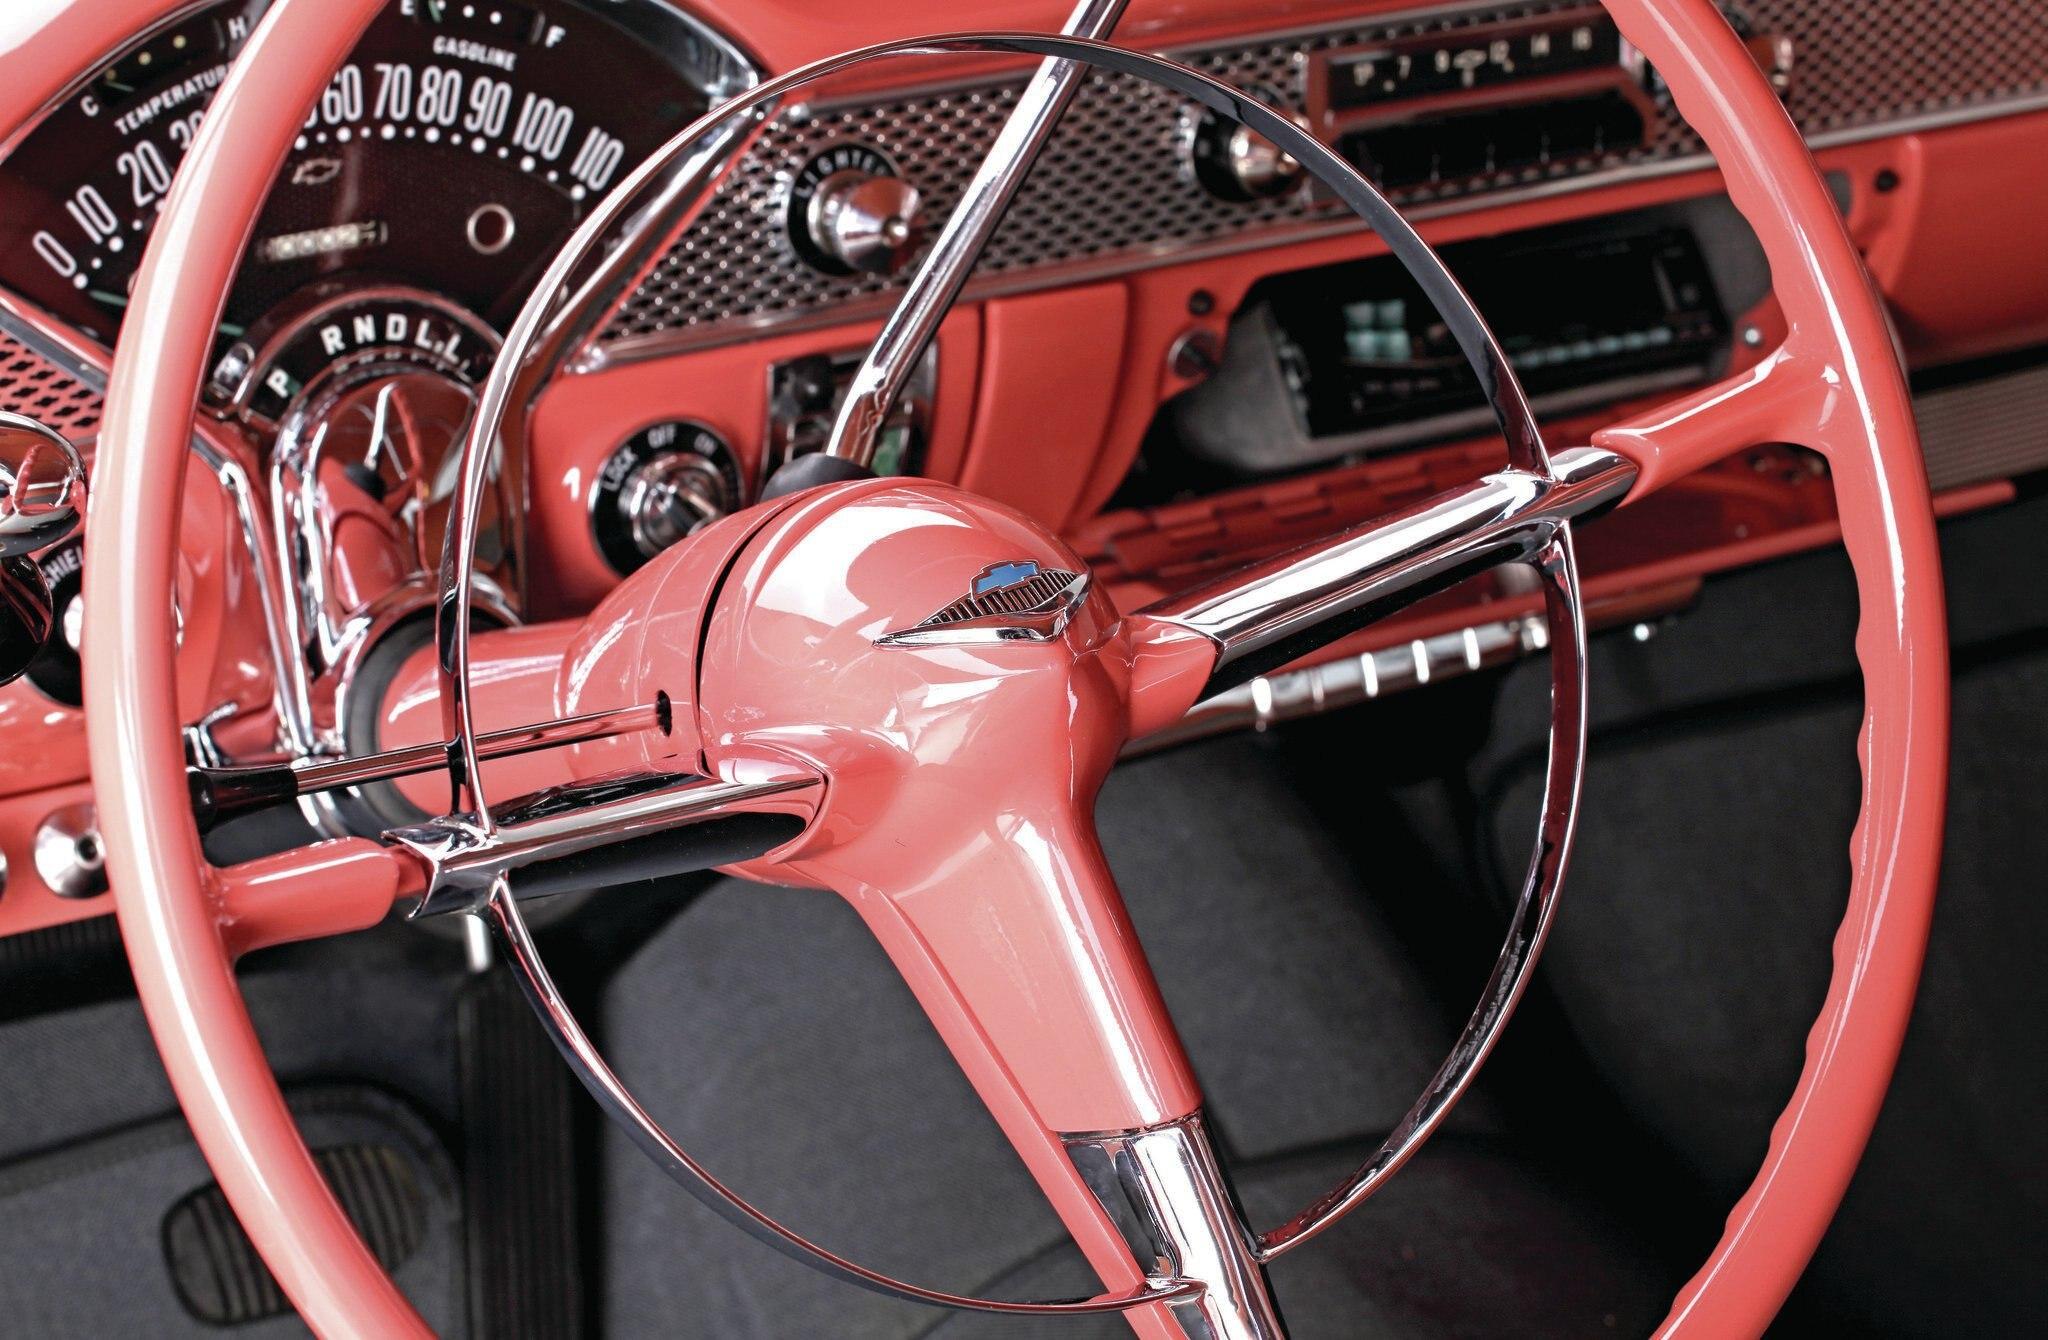 1955 Chevrolet Bel Air The King Of Bel Air